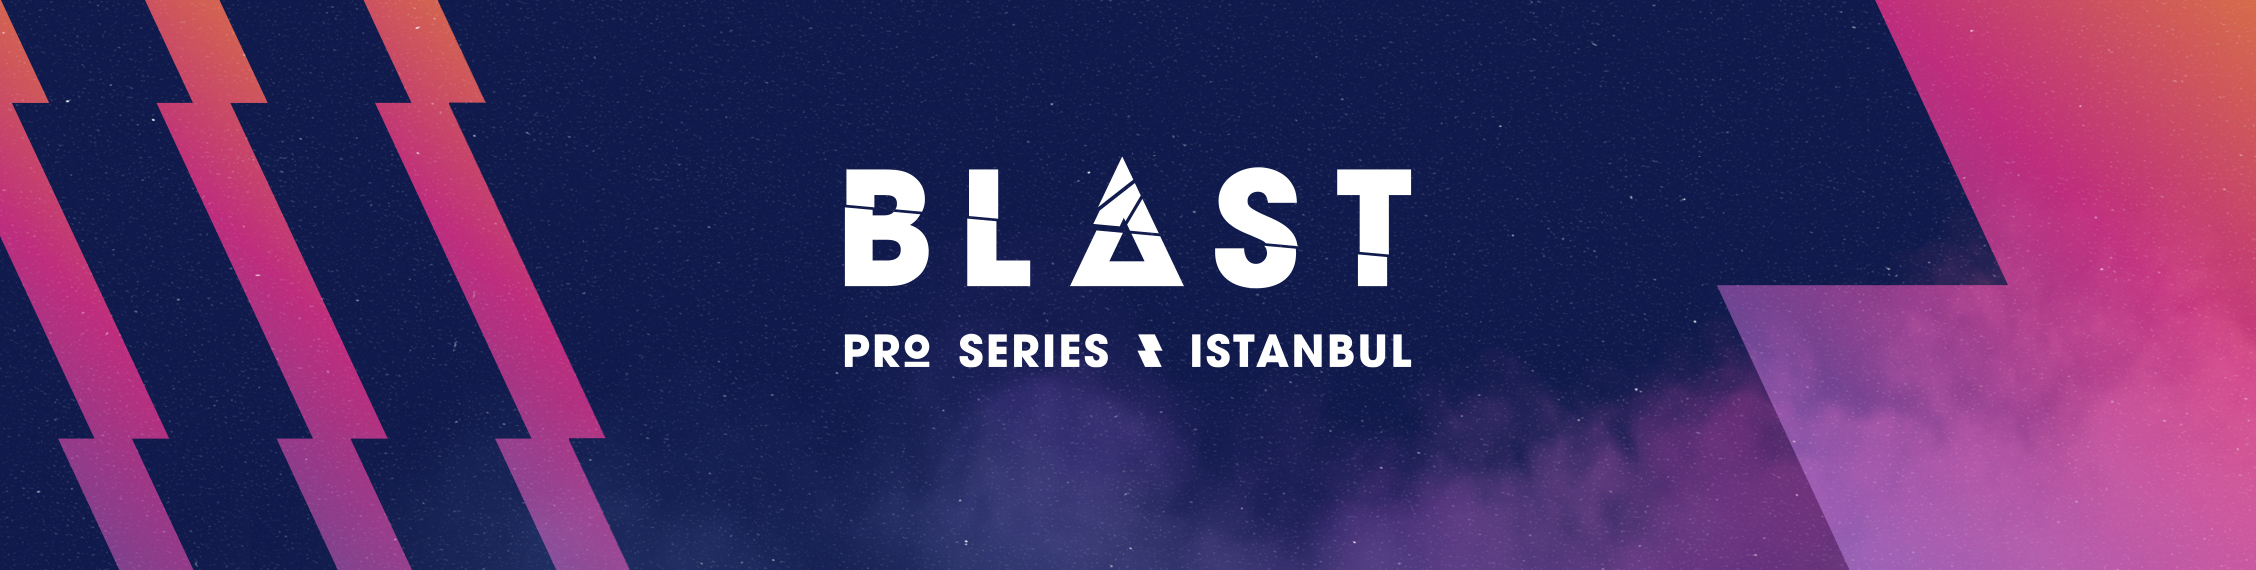 BLAST Pro Series: Istanbul 2018